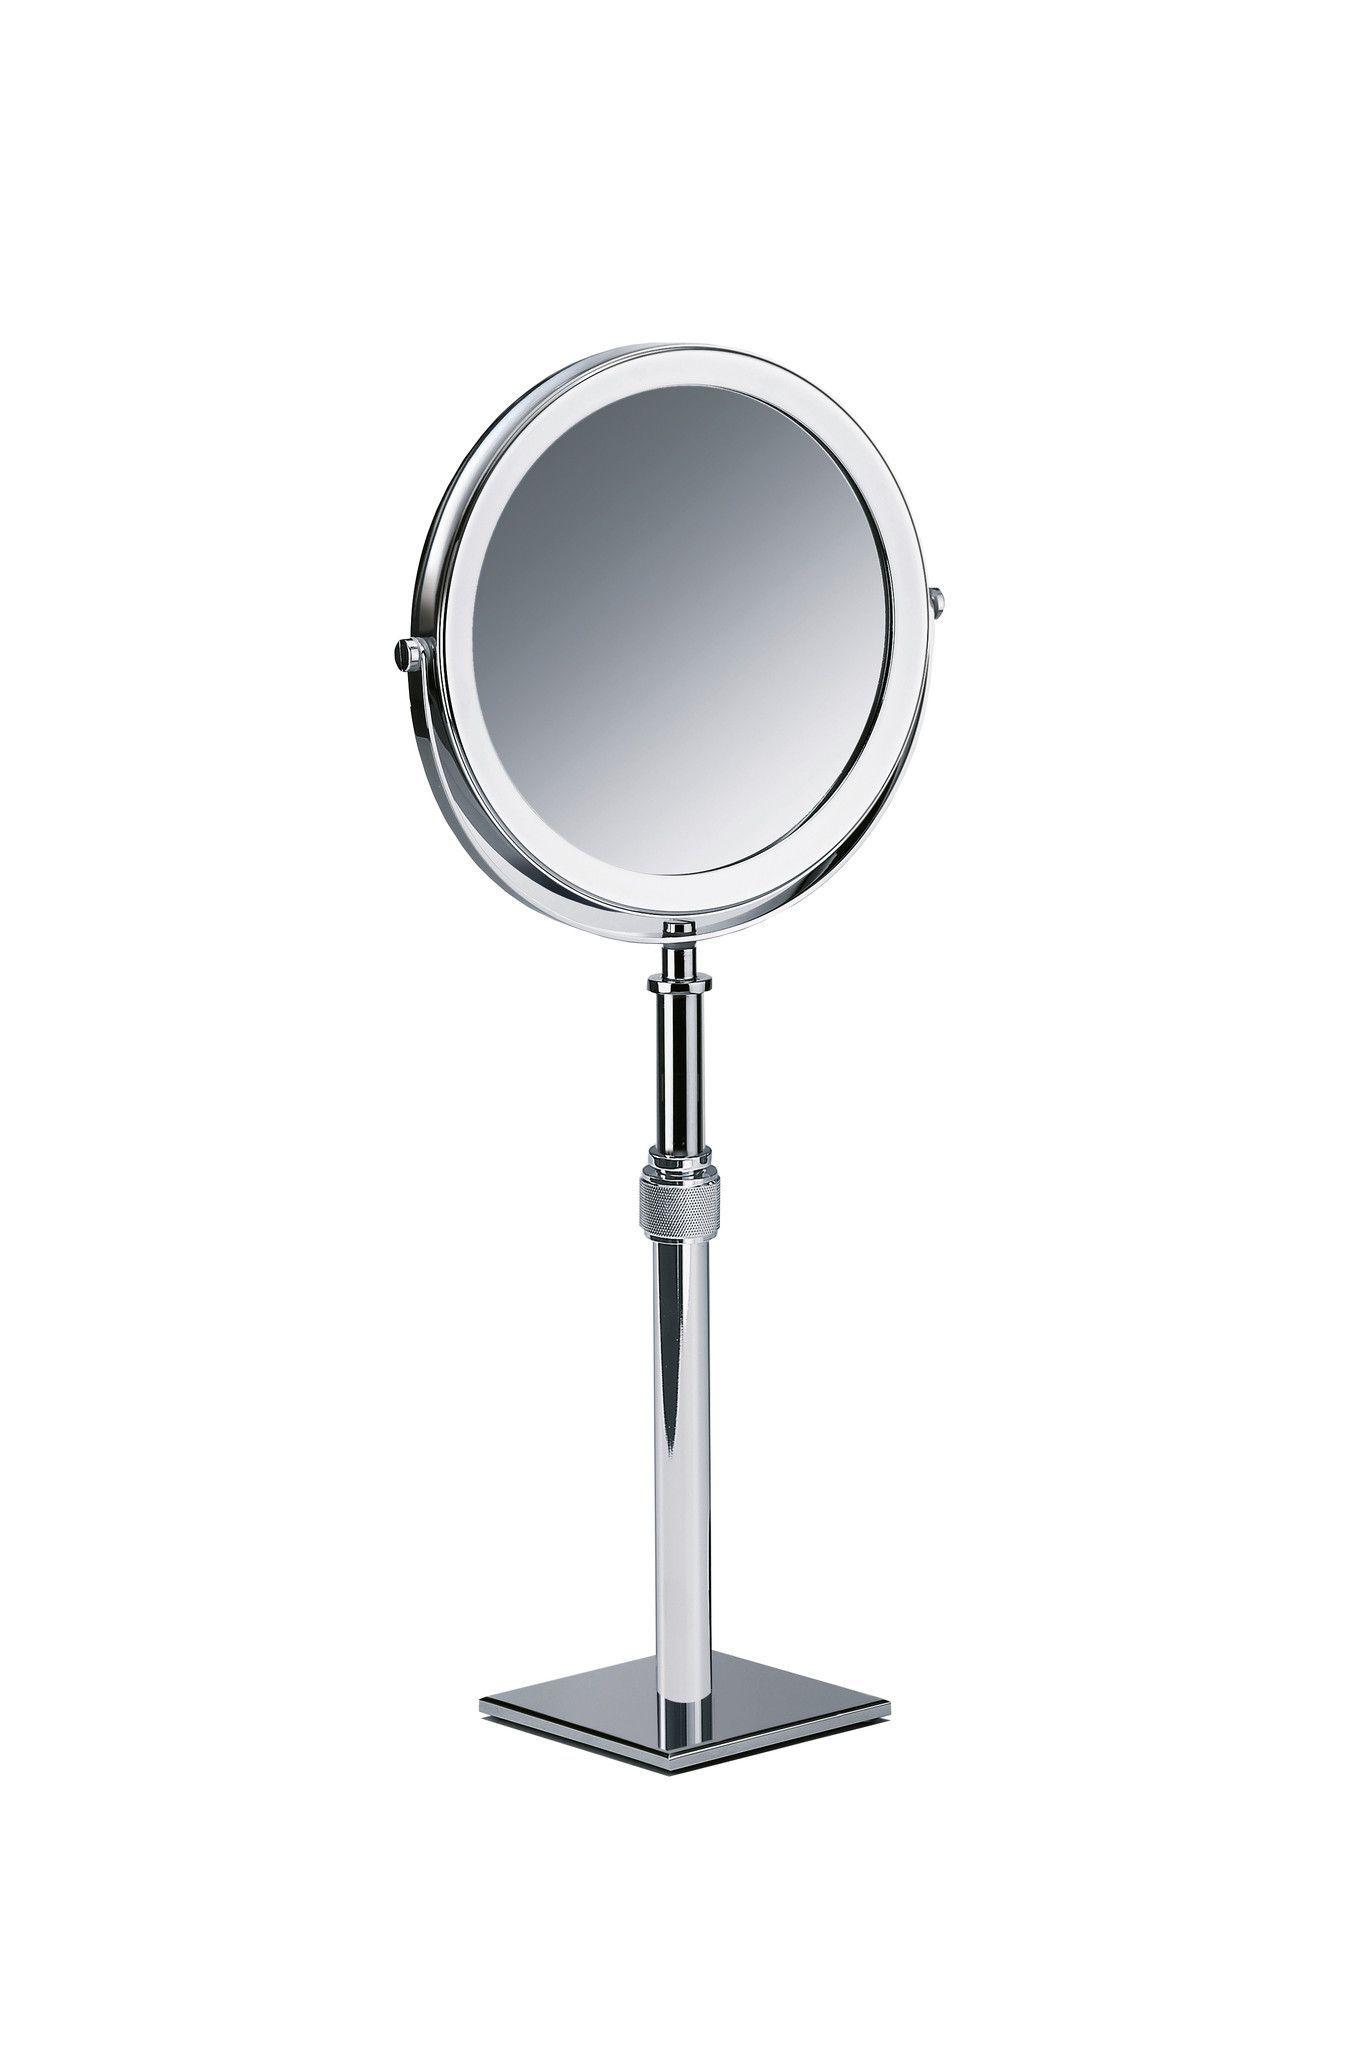 Dwba table height adjustable cosmetic makeup 3x magnifying mirror walther table height adjustable cosmetic makeup 3x magnifying mirror chrome watchthetrailerfo